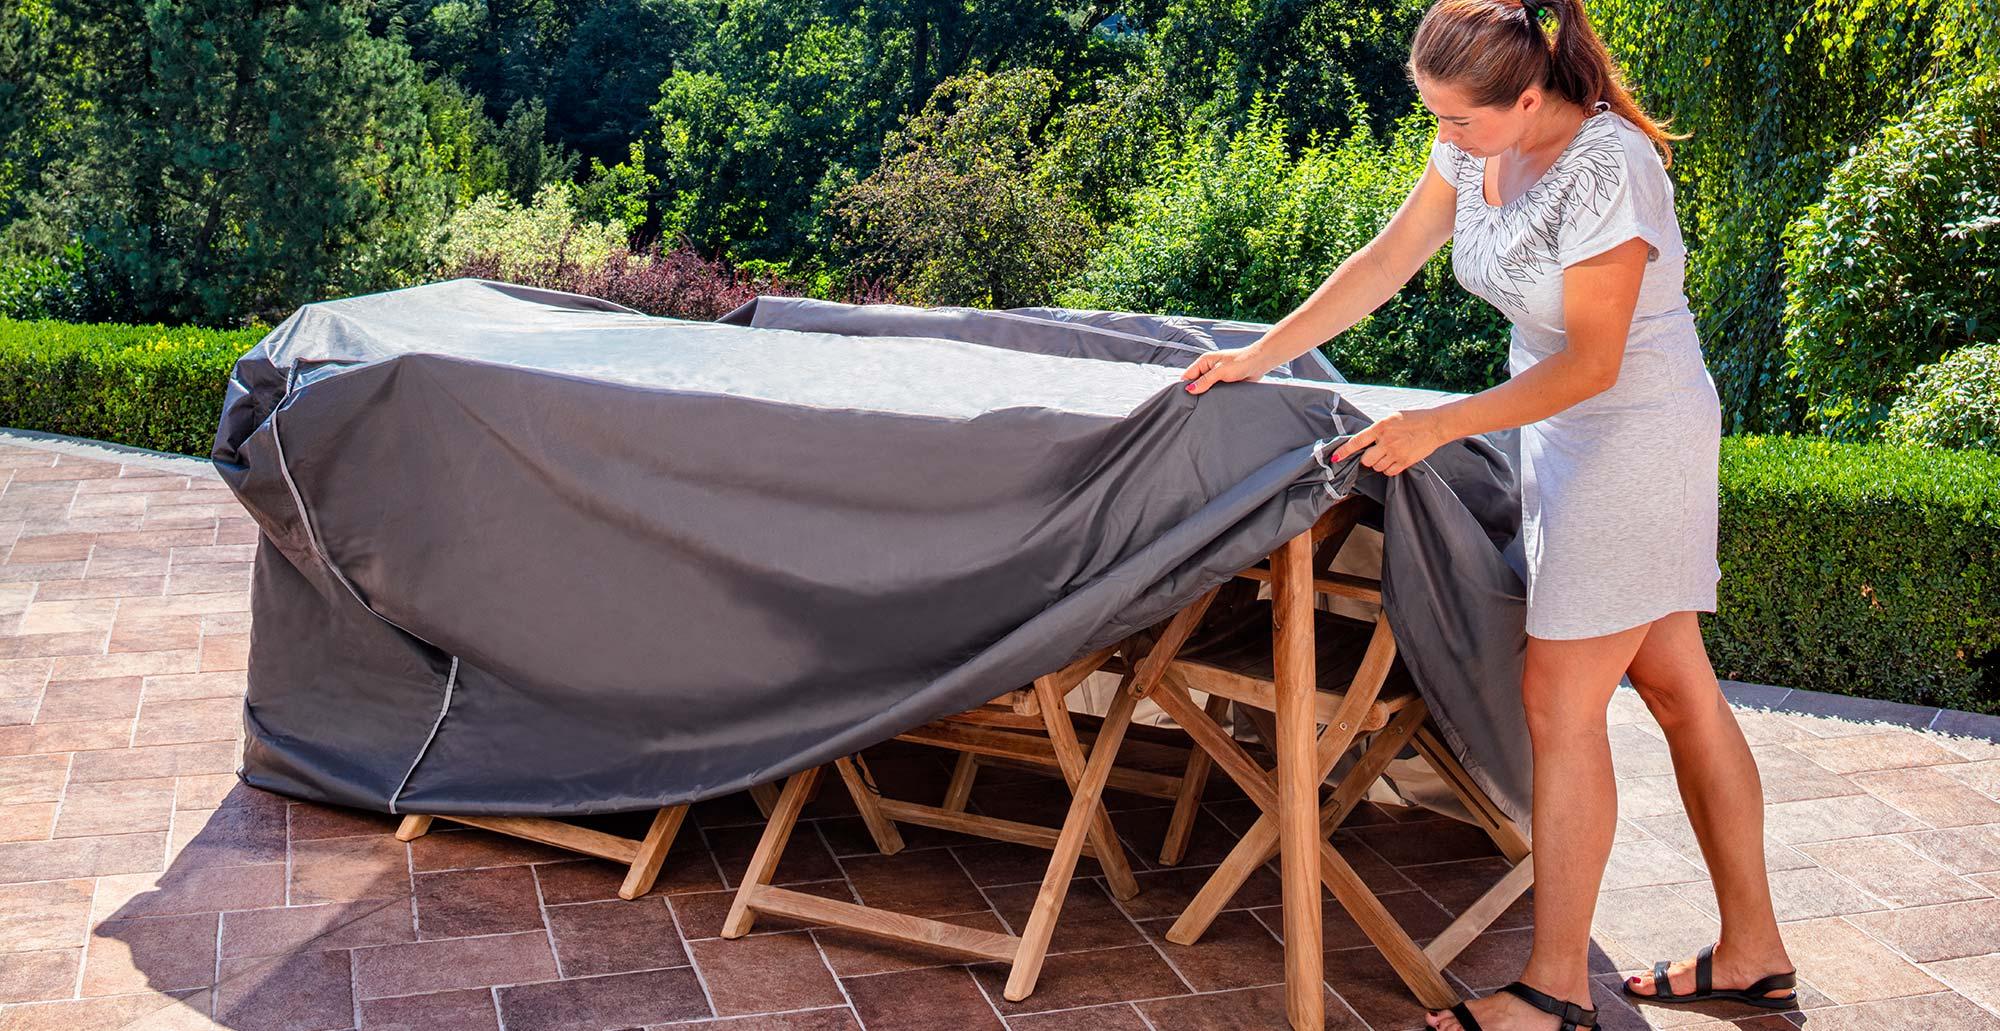 Ochrana zahradního nábytku